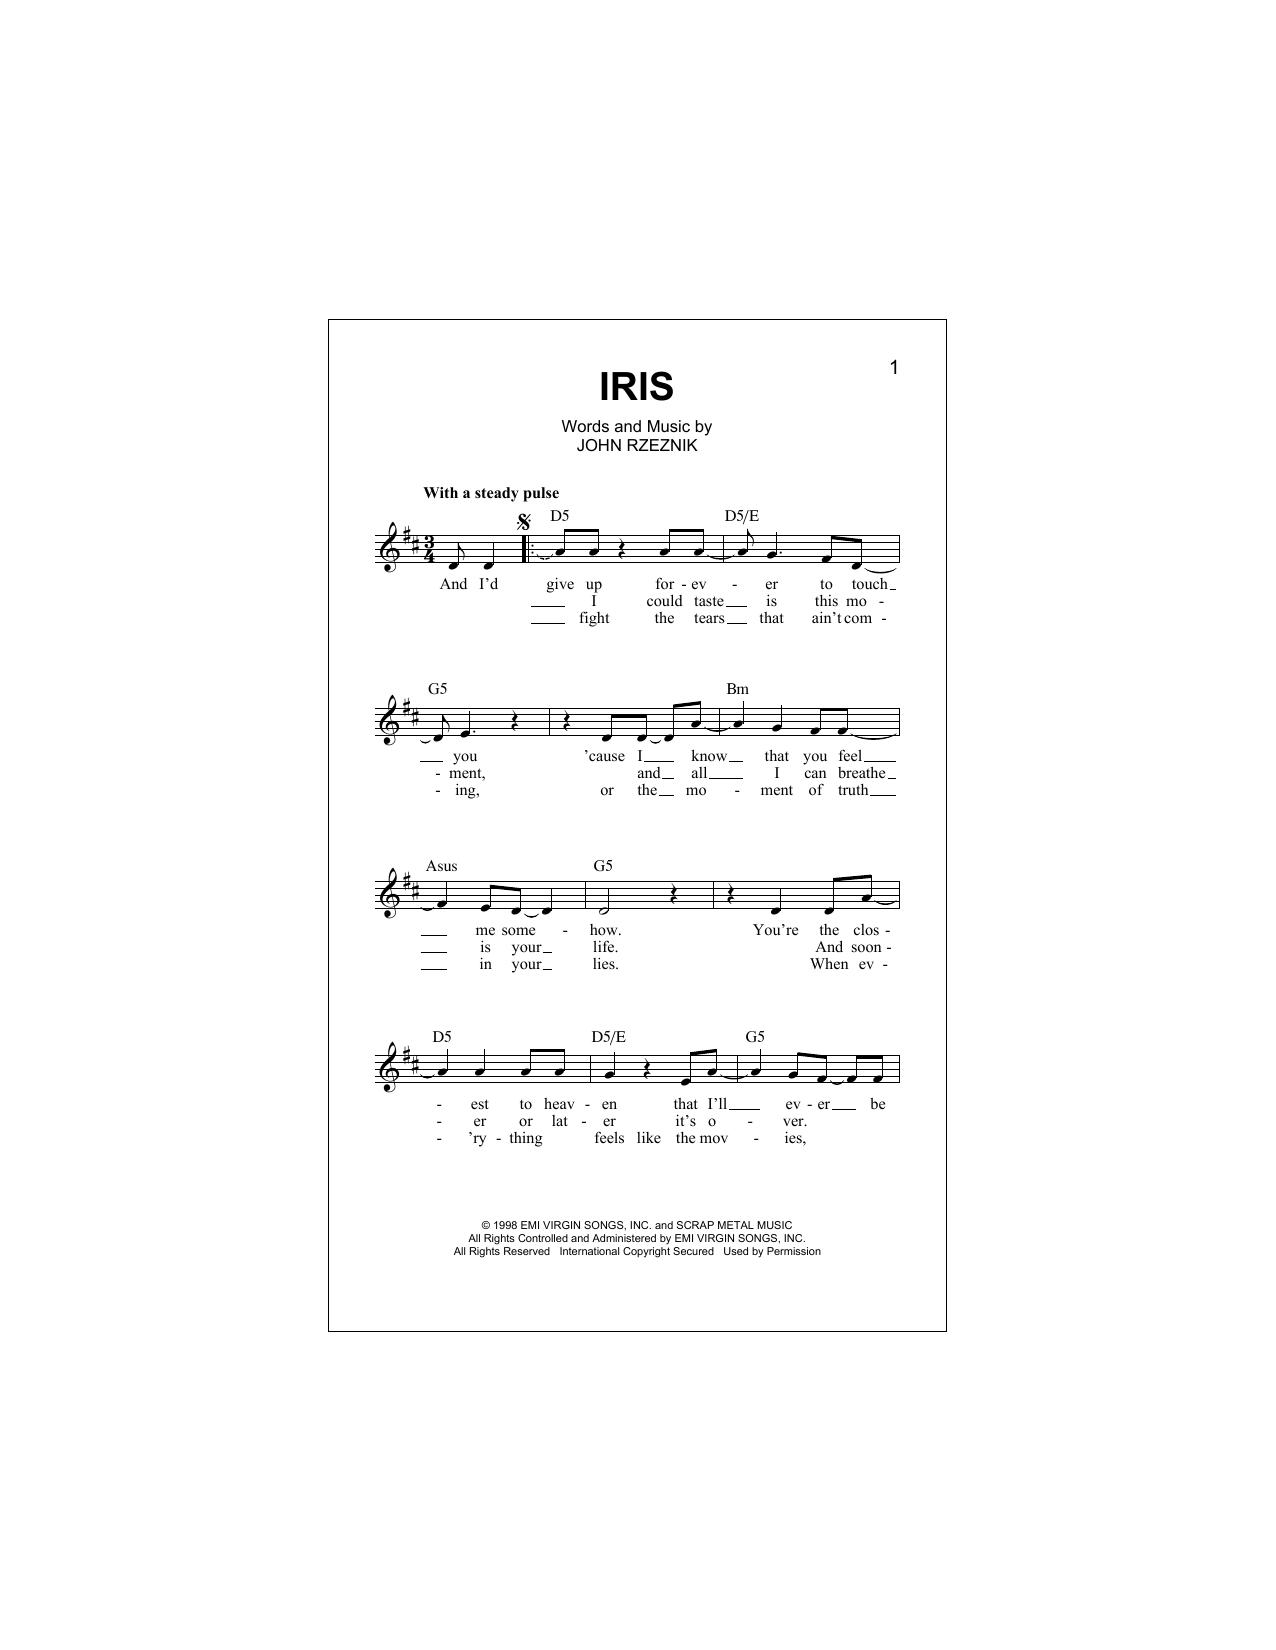 Iris Sheet Music Goo Goo Dolls Melody Line Lyrics Chords